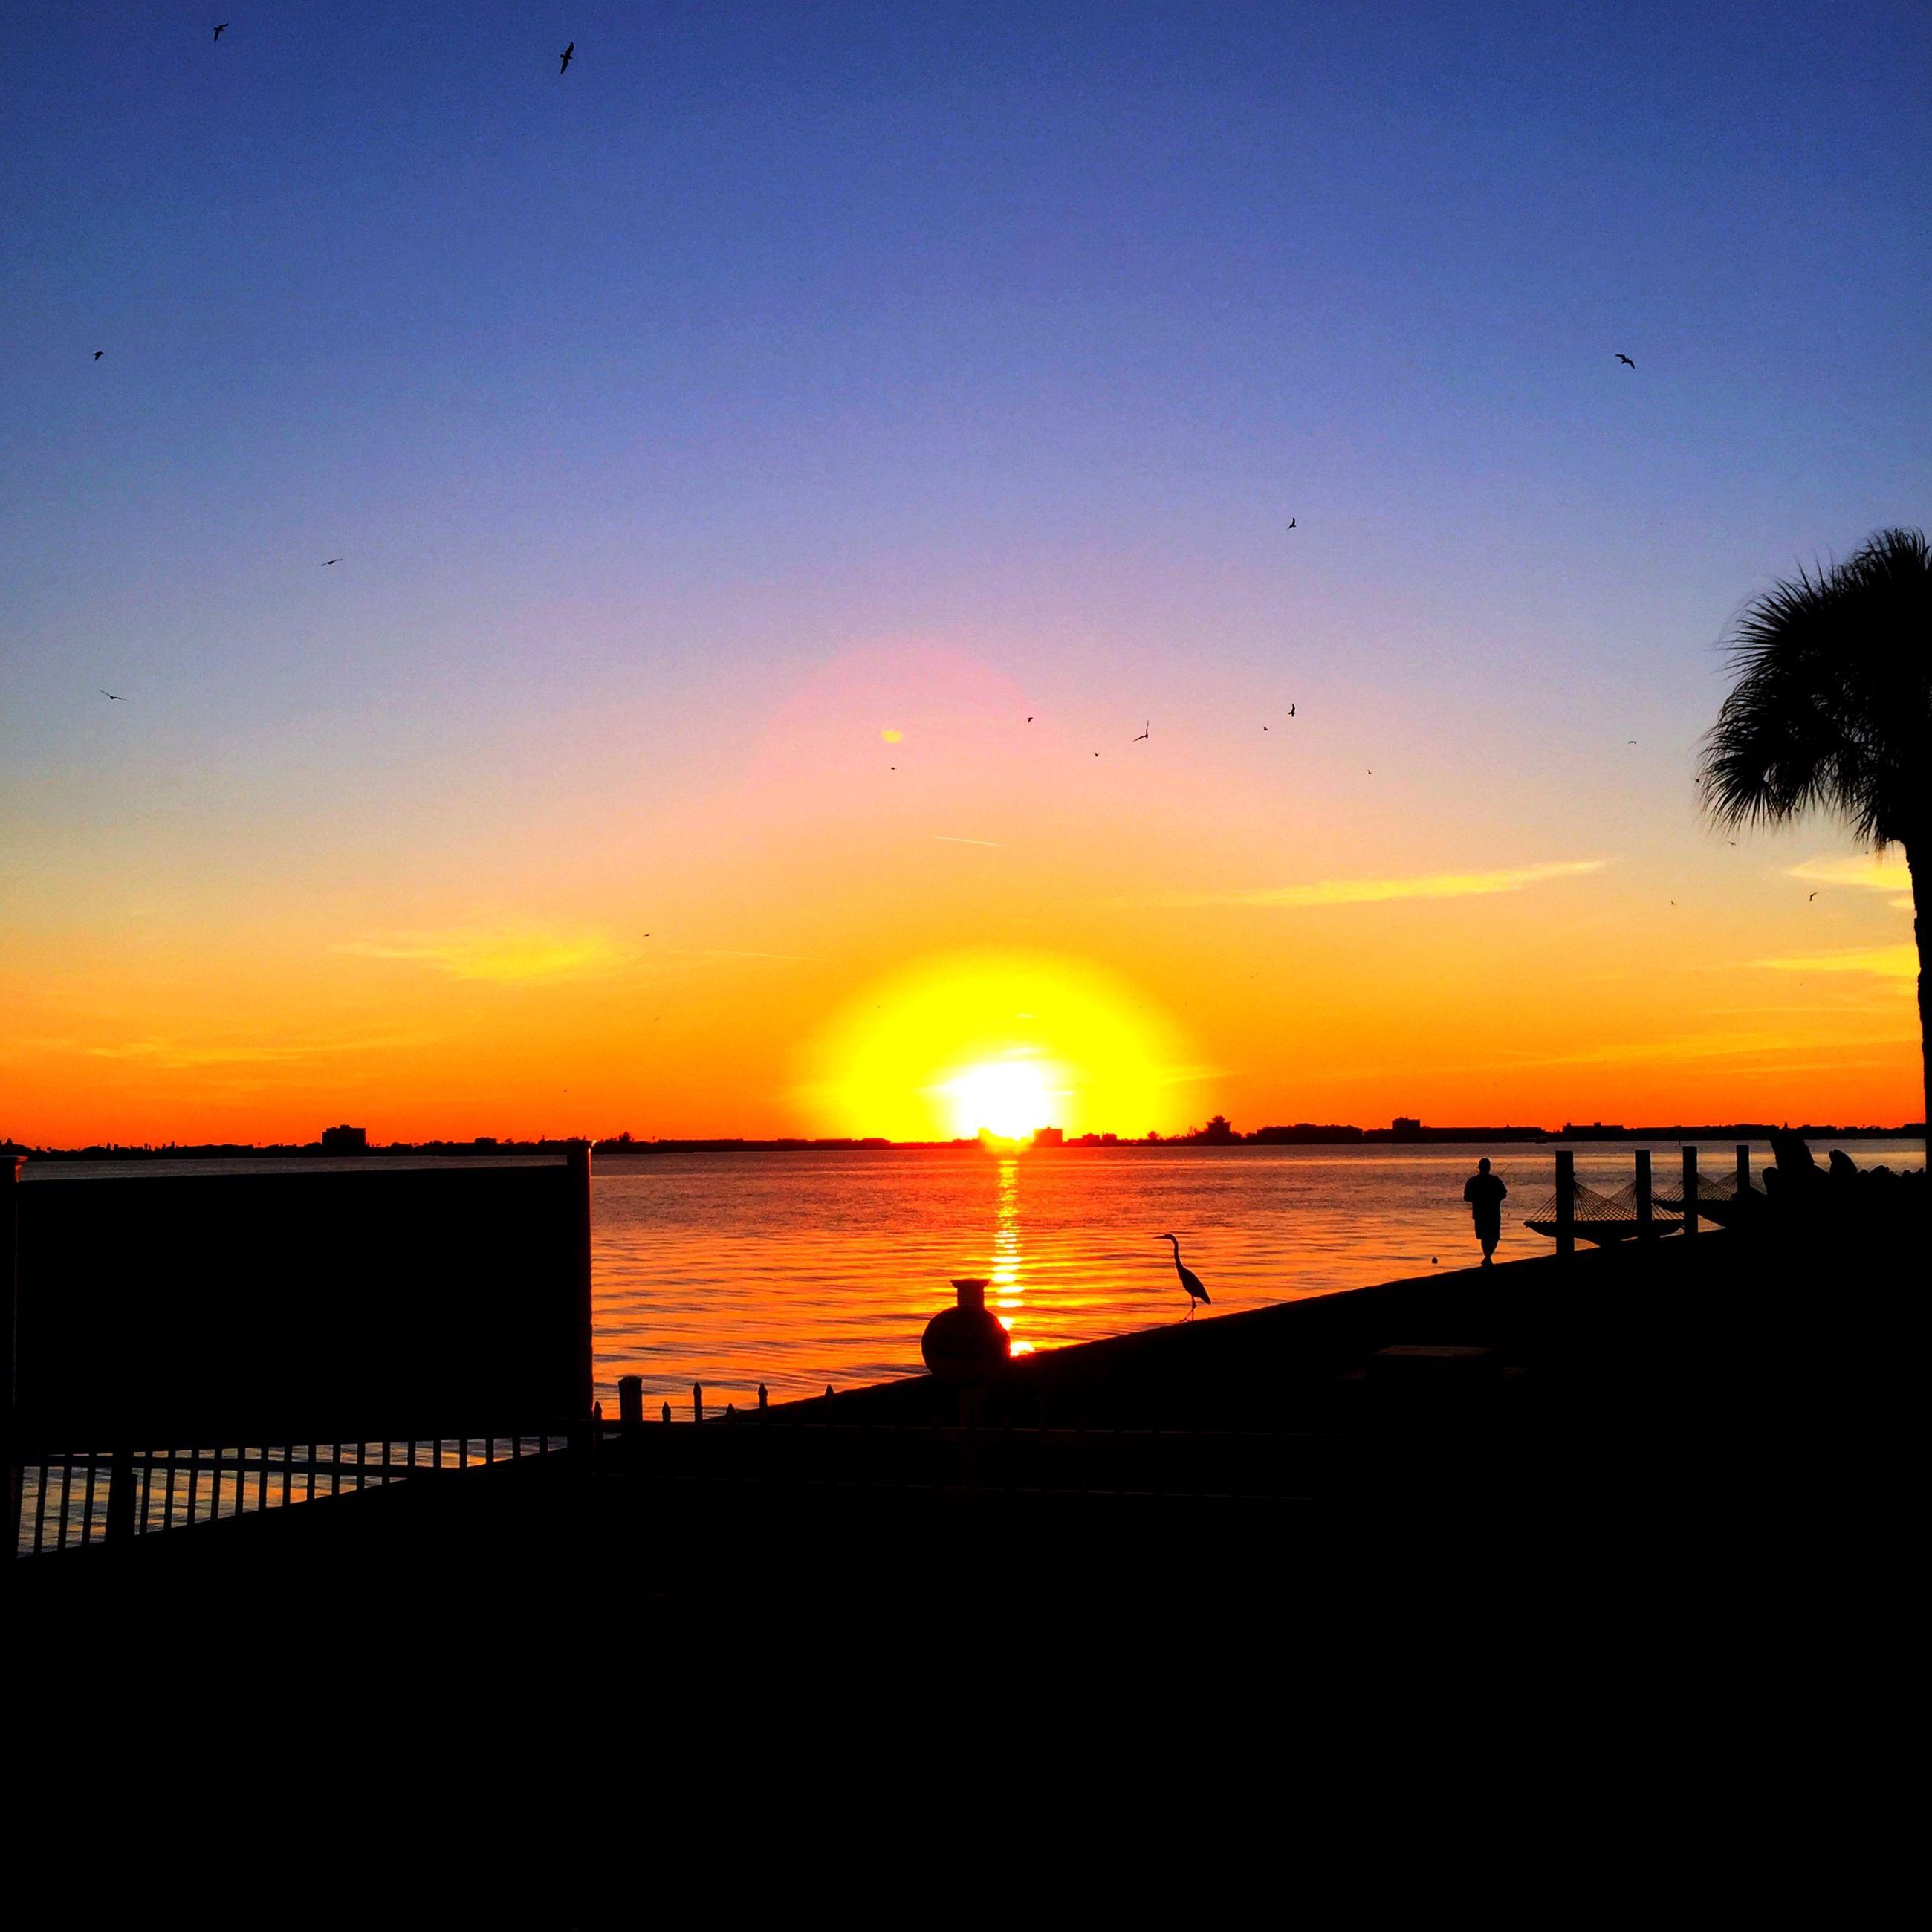 sunset, silhouette, sun, water, scenics, orange color, sea, beauty in nature, tranquil scene, horizon over water, sky, tranquility, idyllic, nature, bird, sunlight, beach, reflection, animal themes, outdoors